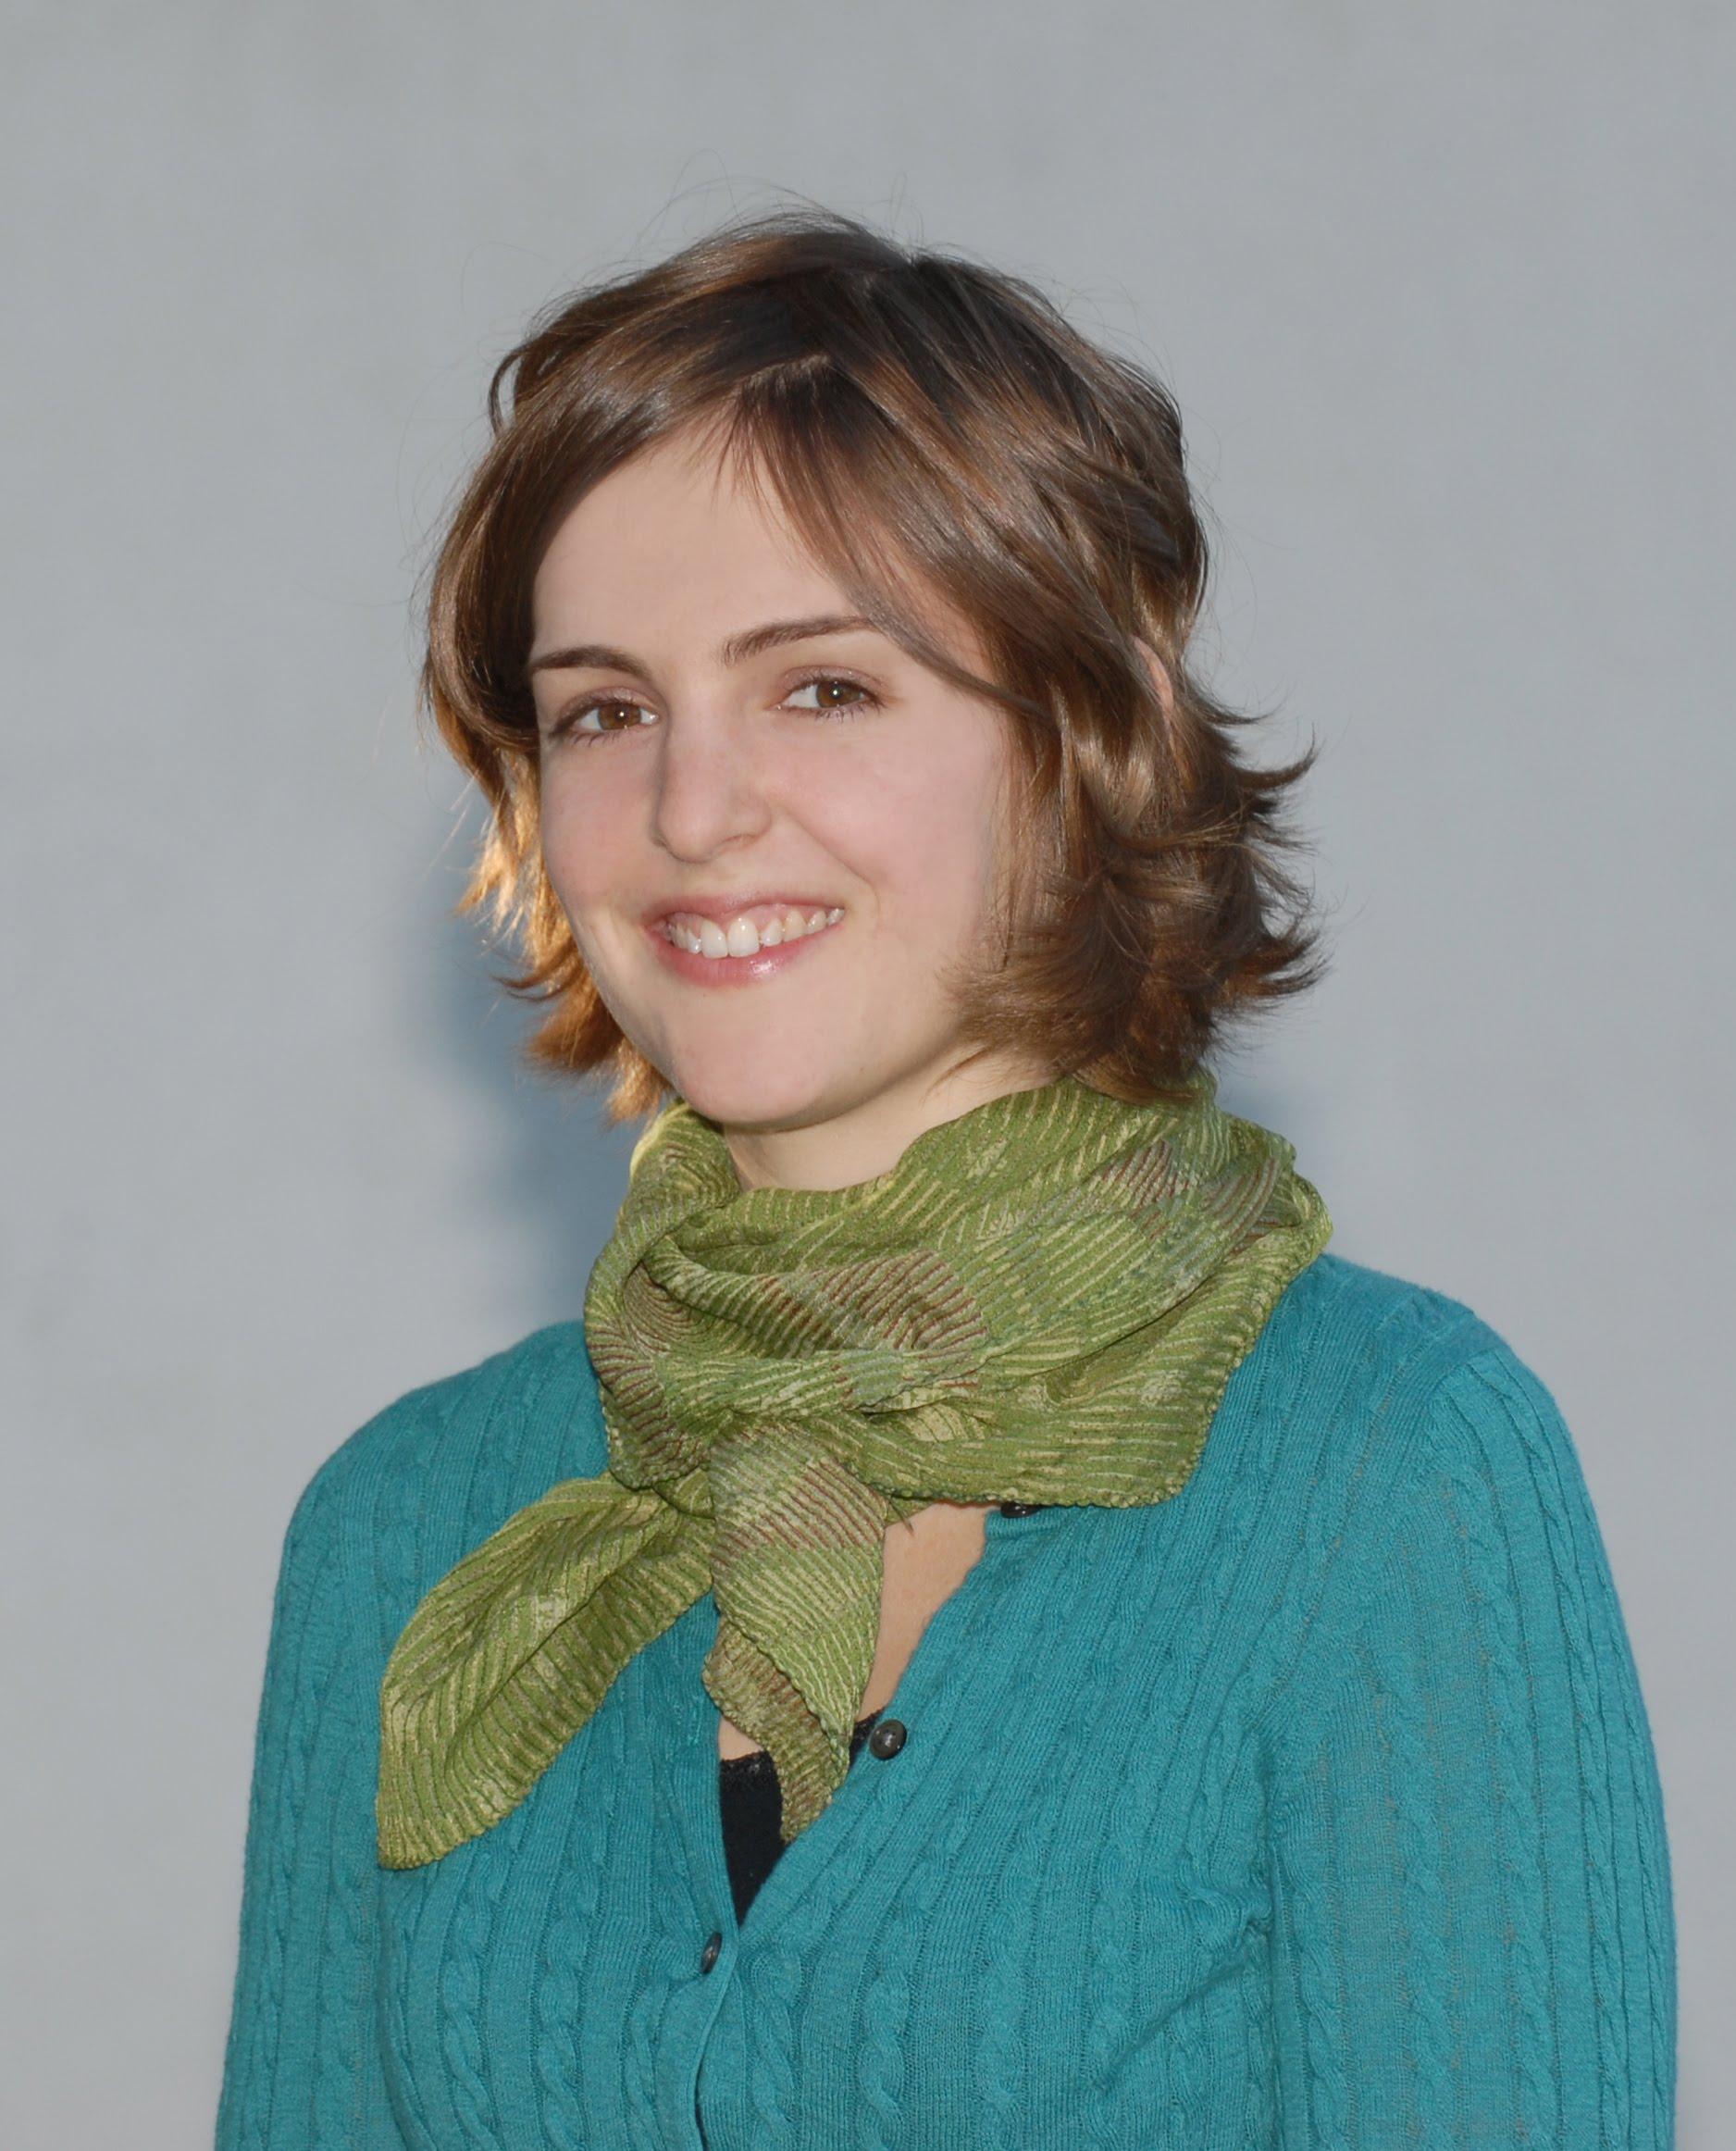 Lindsay Madison